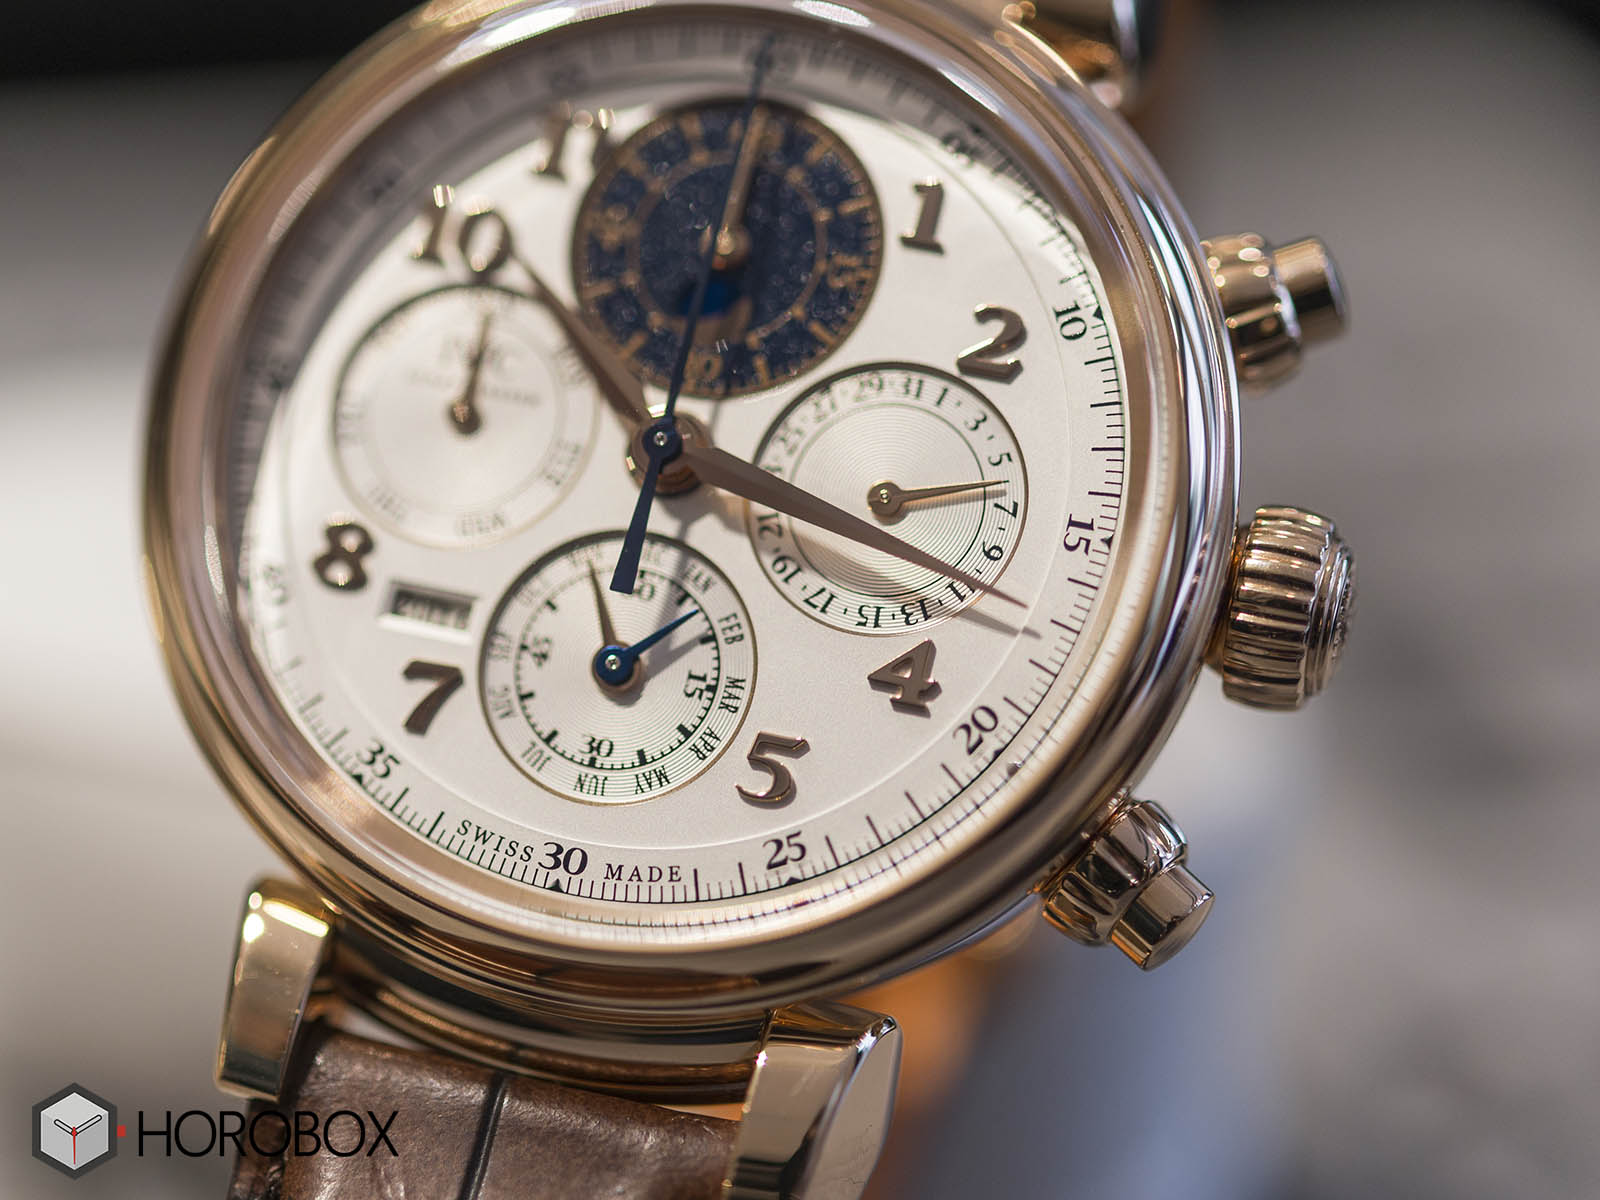 iwc-da-vinci-perpetual-calendar-chronograph-iw392101-3-.jpg